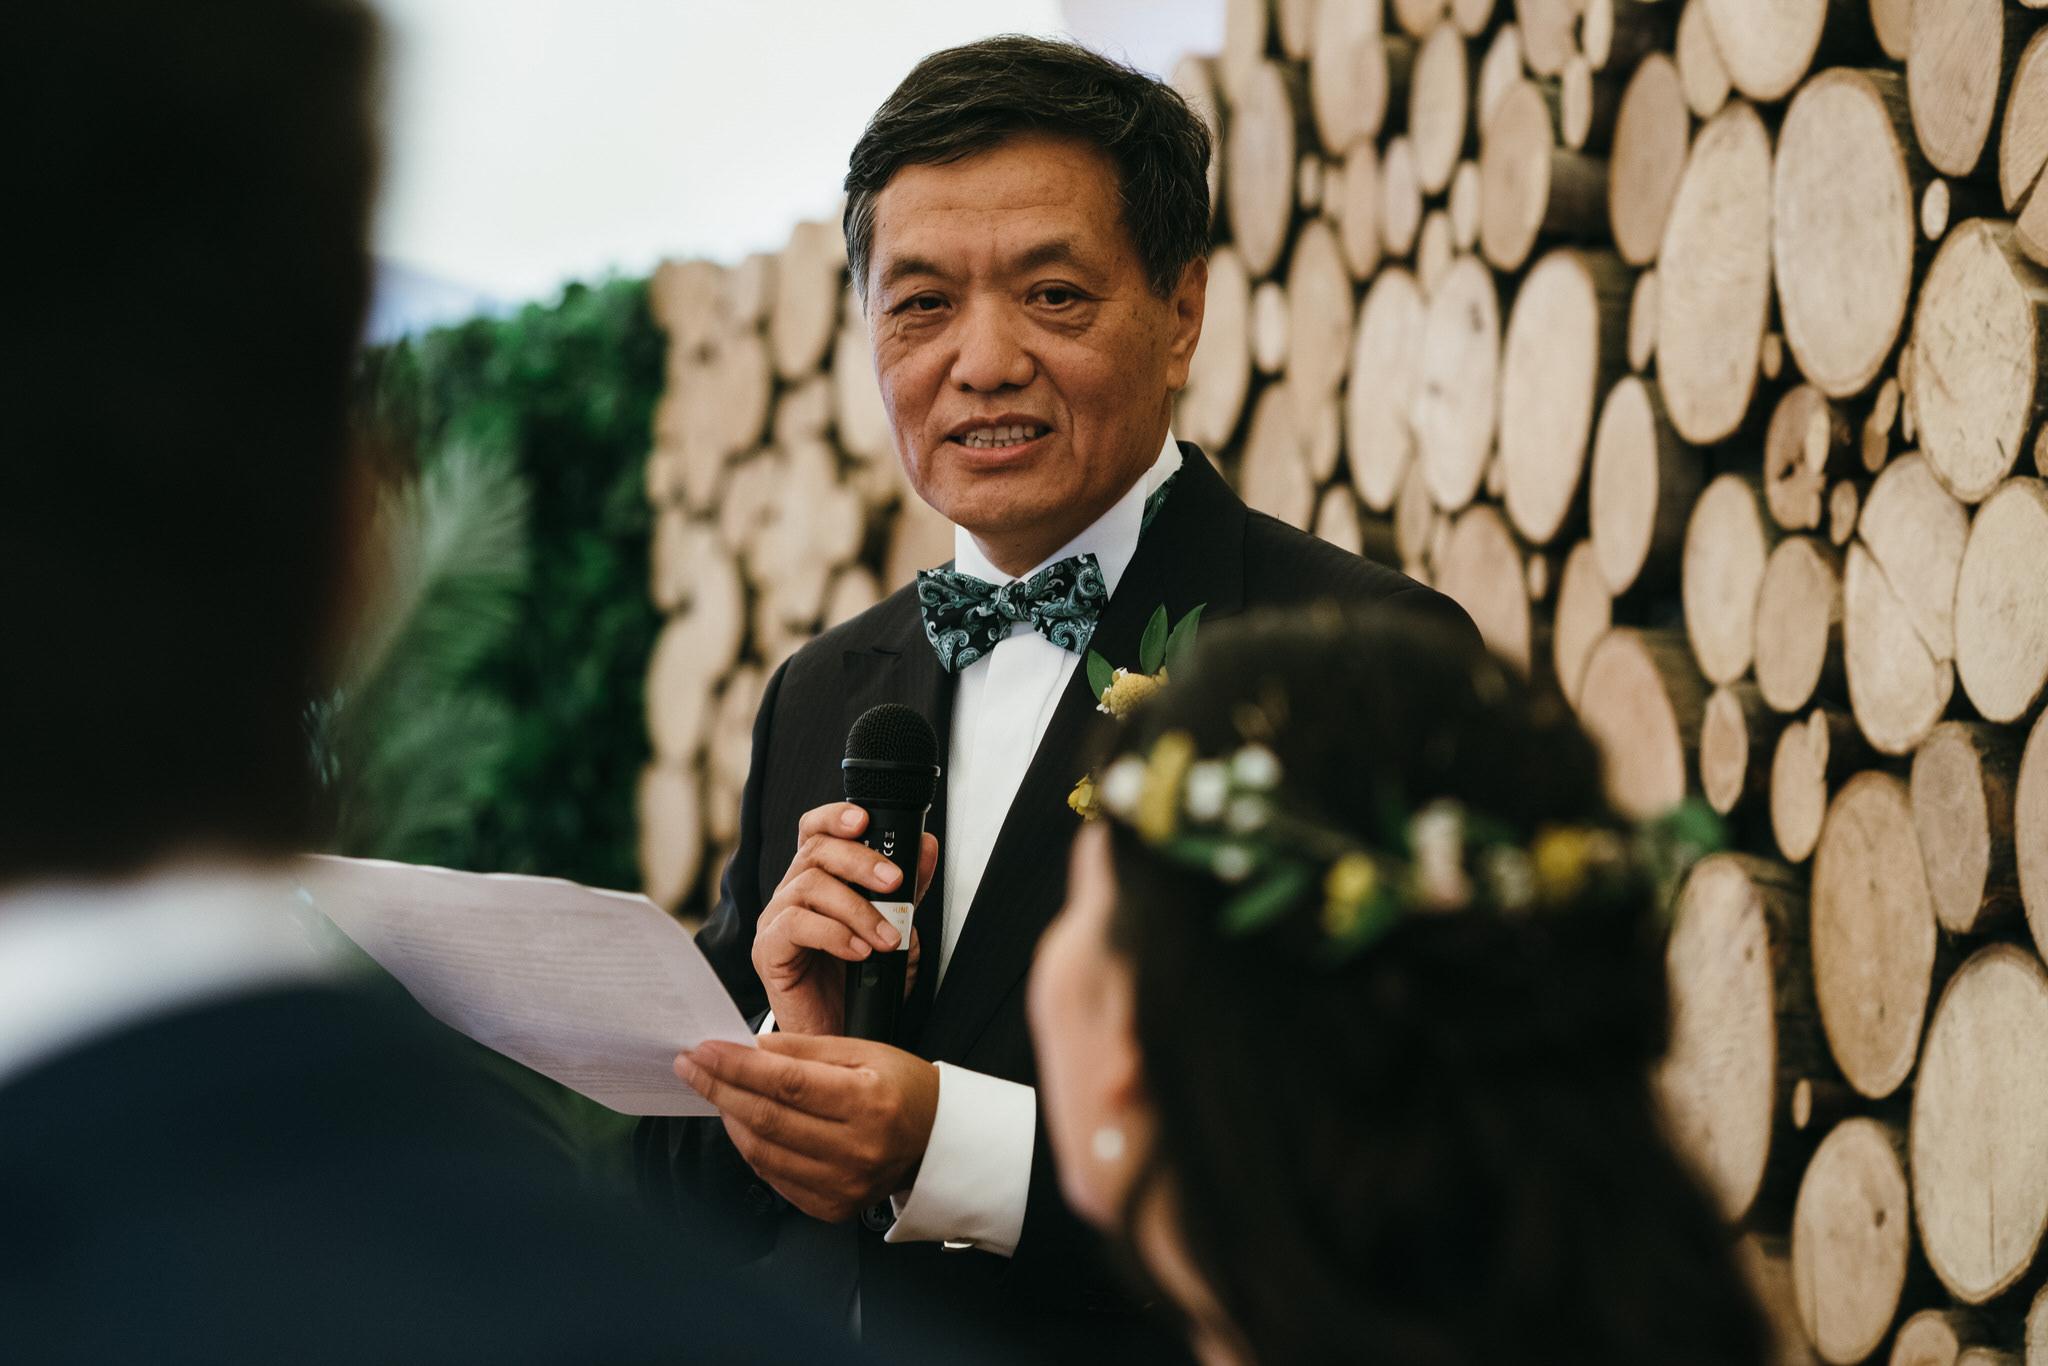 The Dreys Kent Wedding Groom Speech